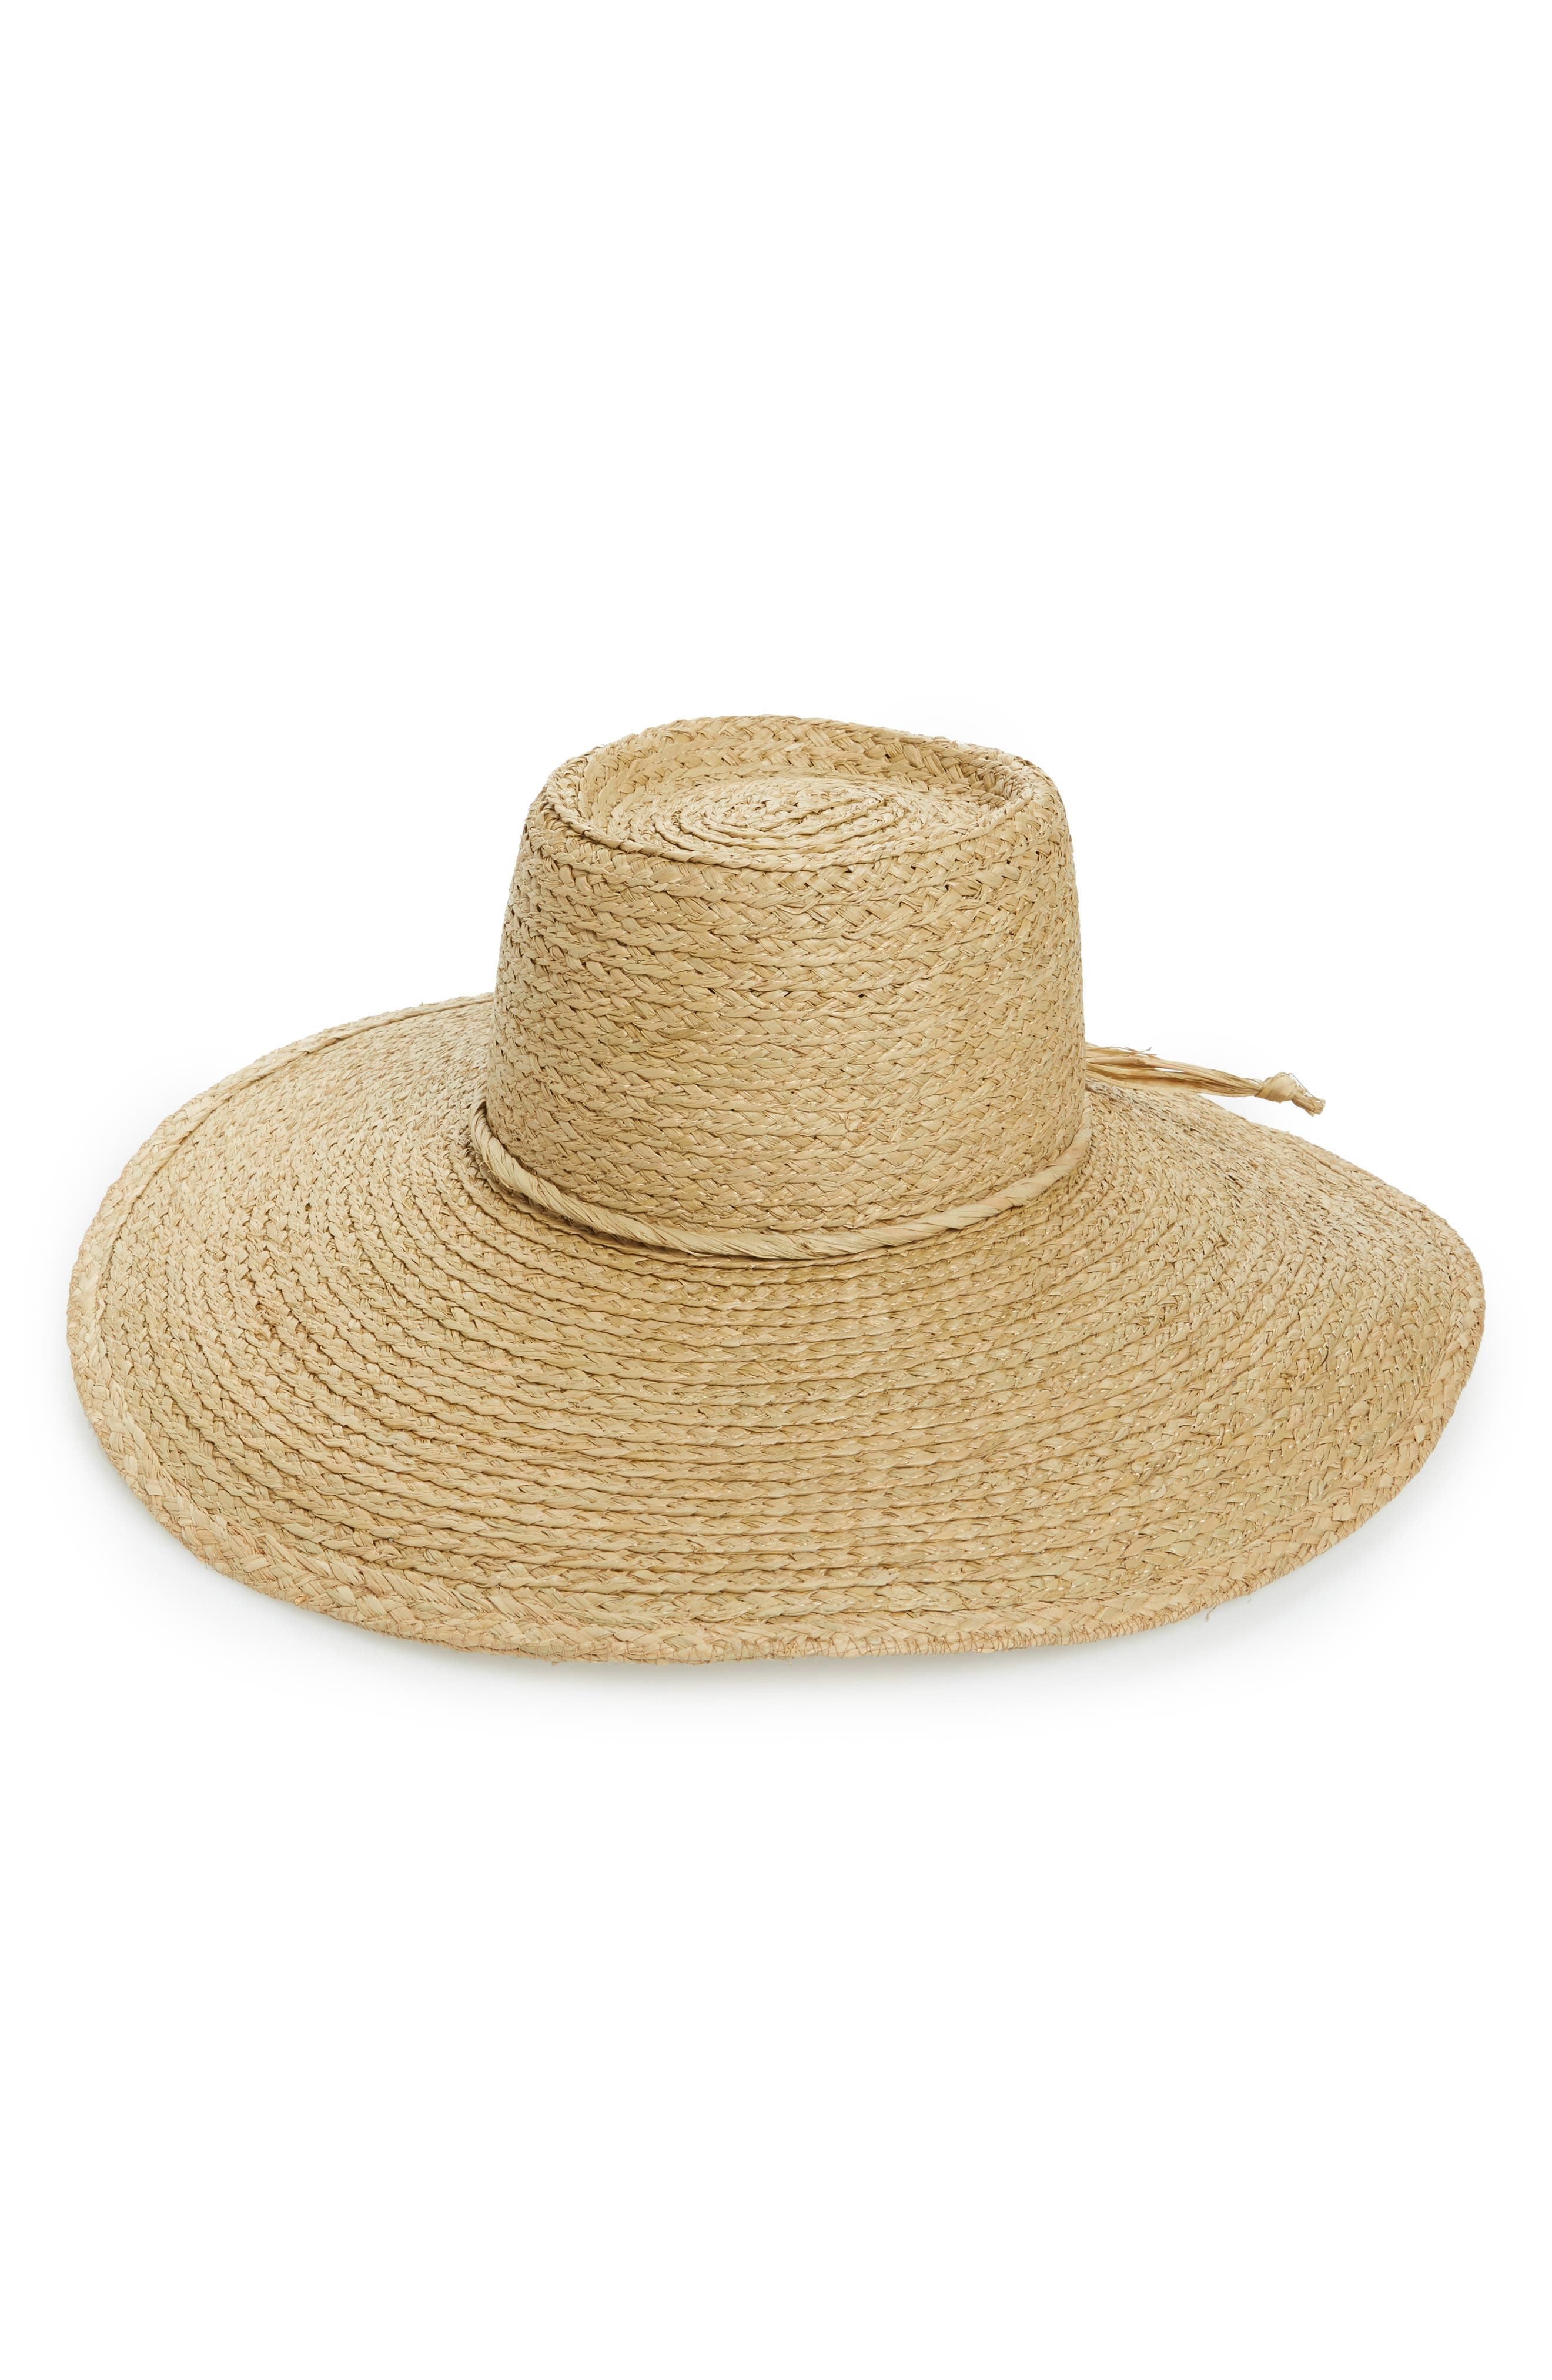 Alternate Image 1 Selected - Brixton Paite Raffia Floppy Hat